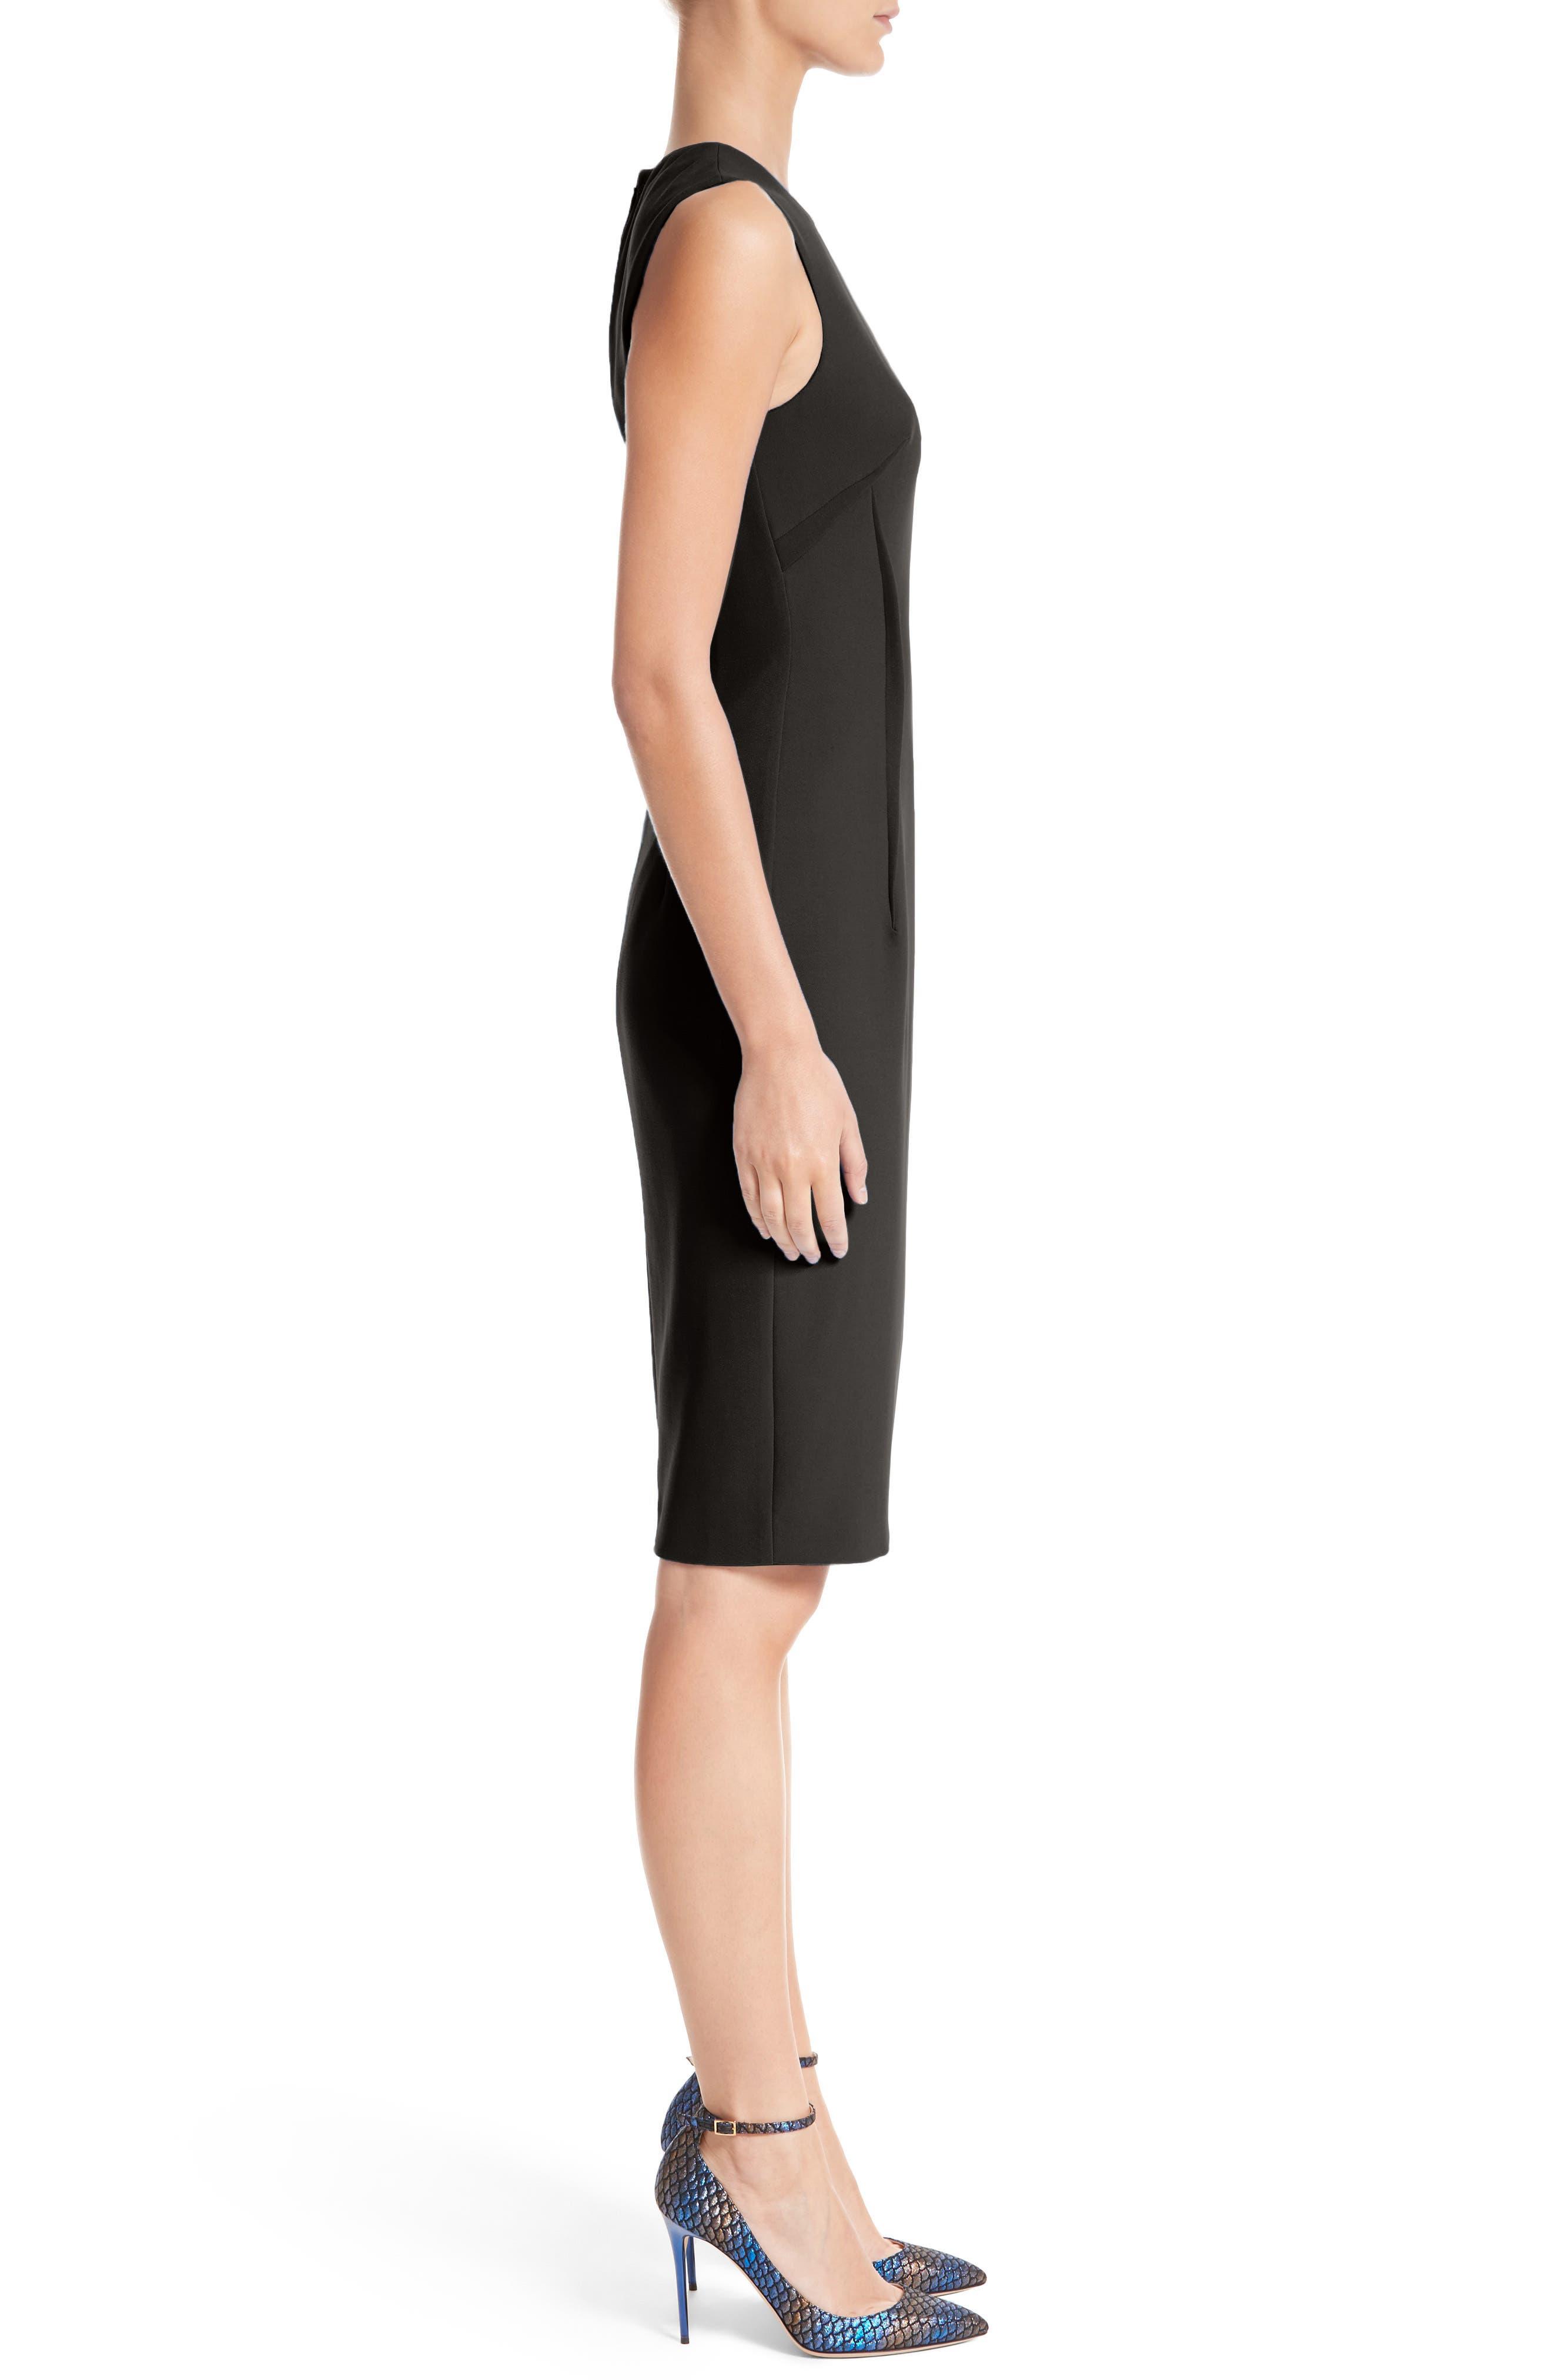 VERSACE COLLECTION, Stretch Cady Sheath Dress, Alternate thumbnail 3, color, BLACK